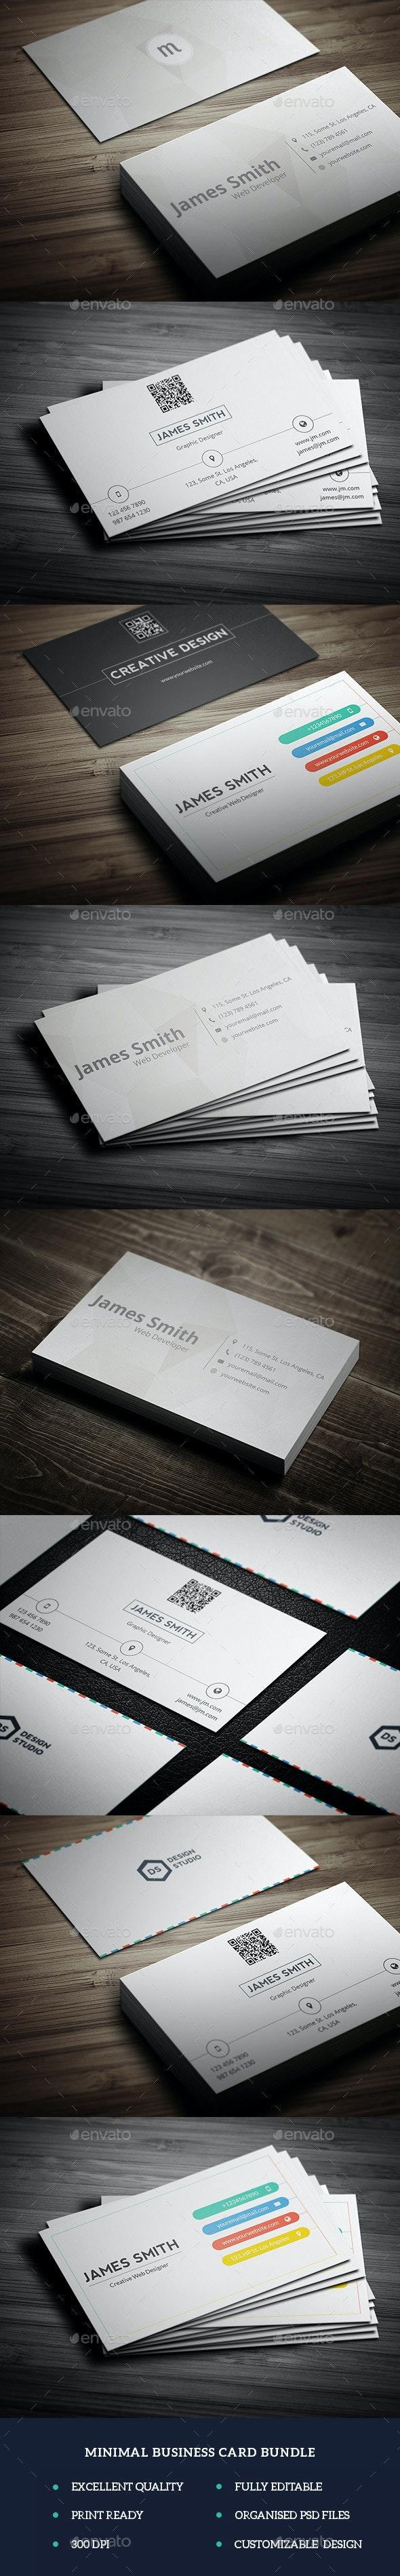 Minimal Business Card Bundle - Corporate Business Cards